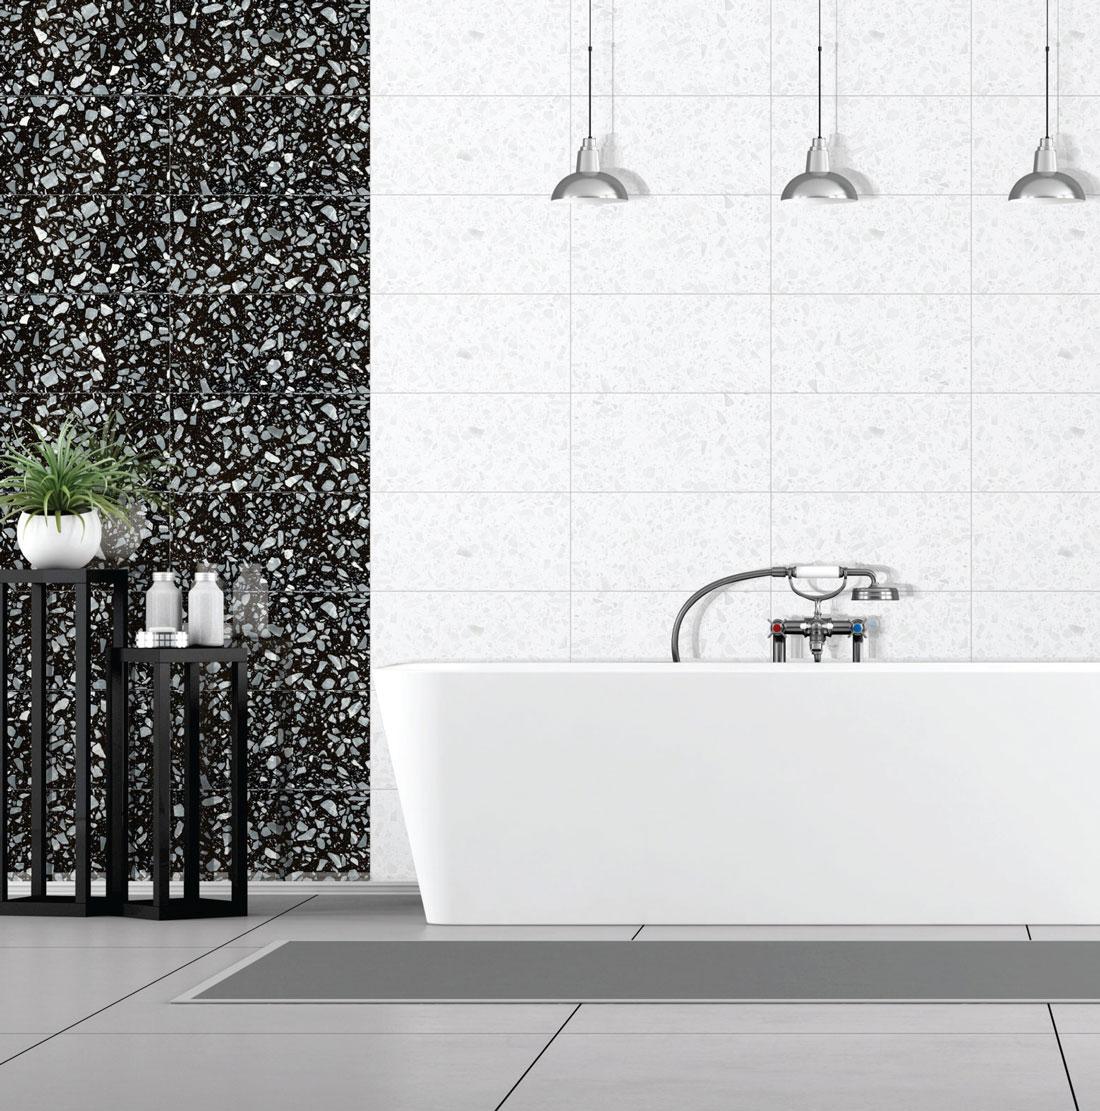 Waterproof shower walls